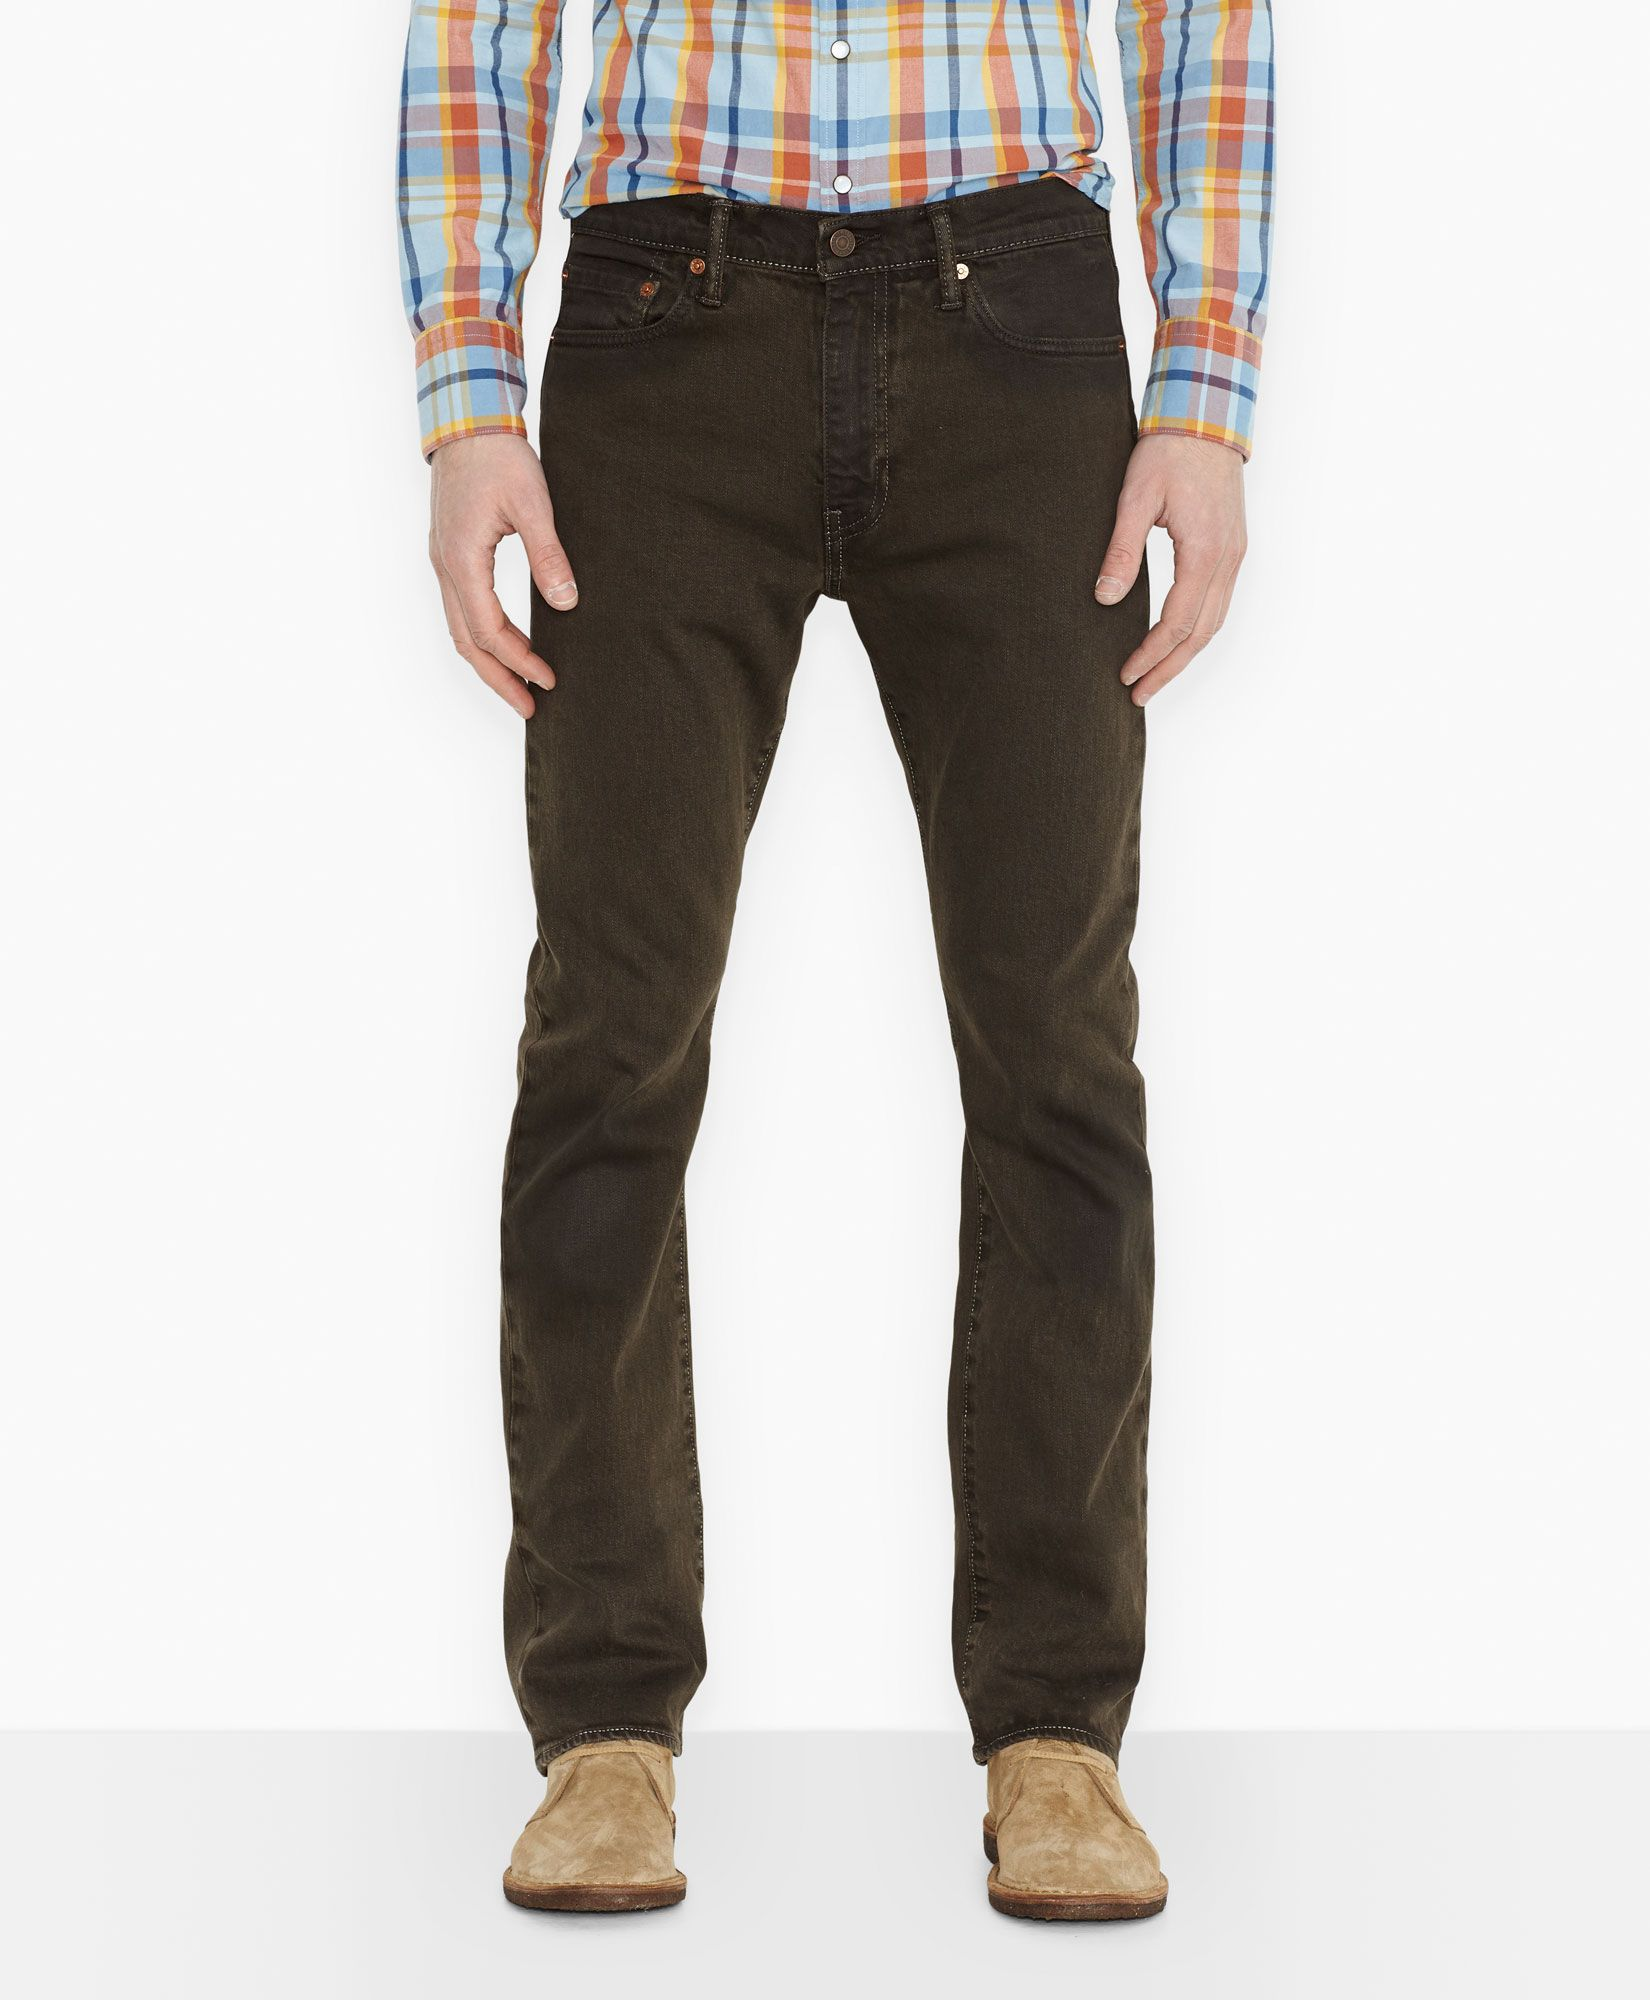 e4193fa57e Levi's 513™ Slim Straight Jeans - Westside - Jeans | Work Wear ...